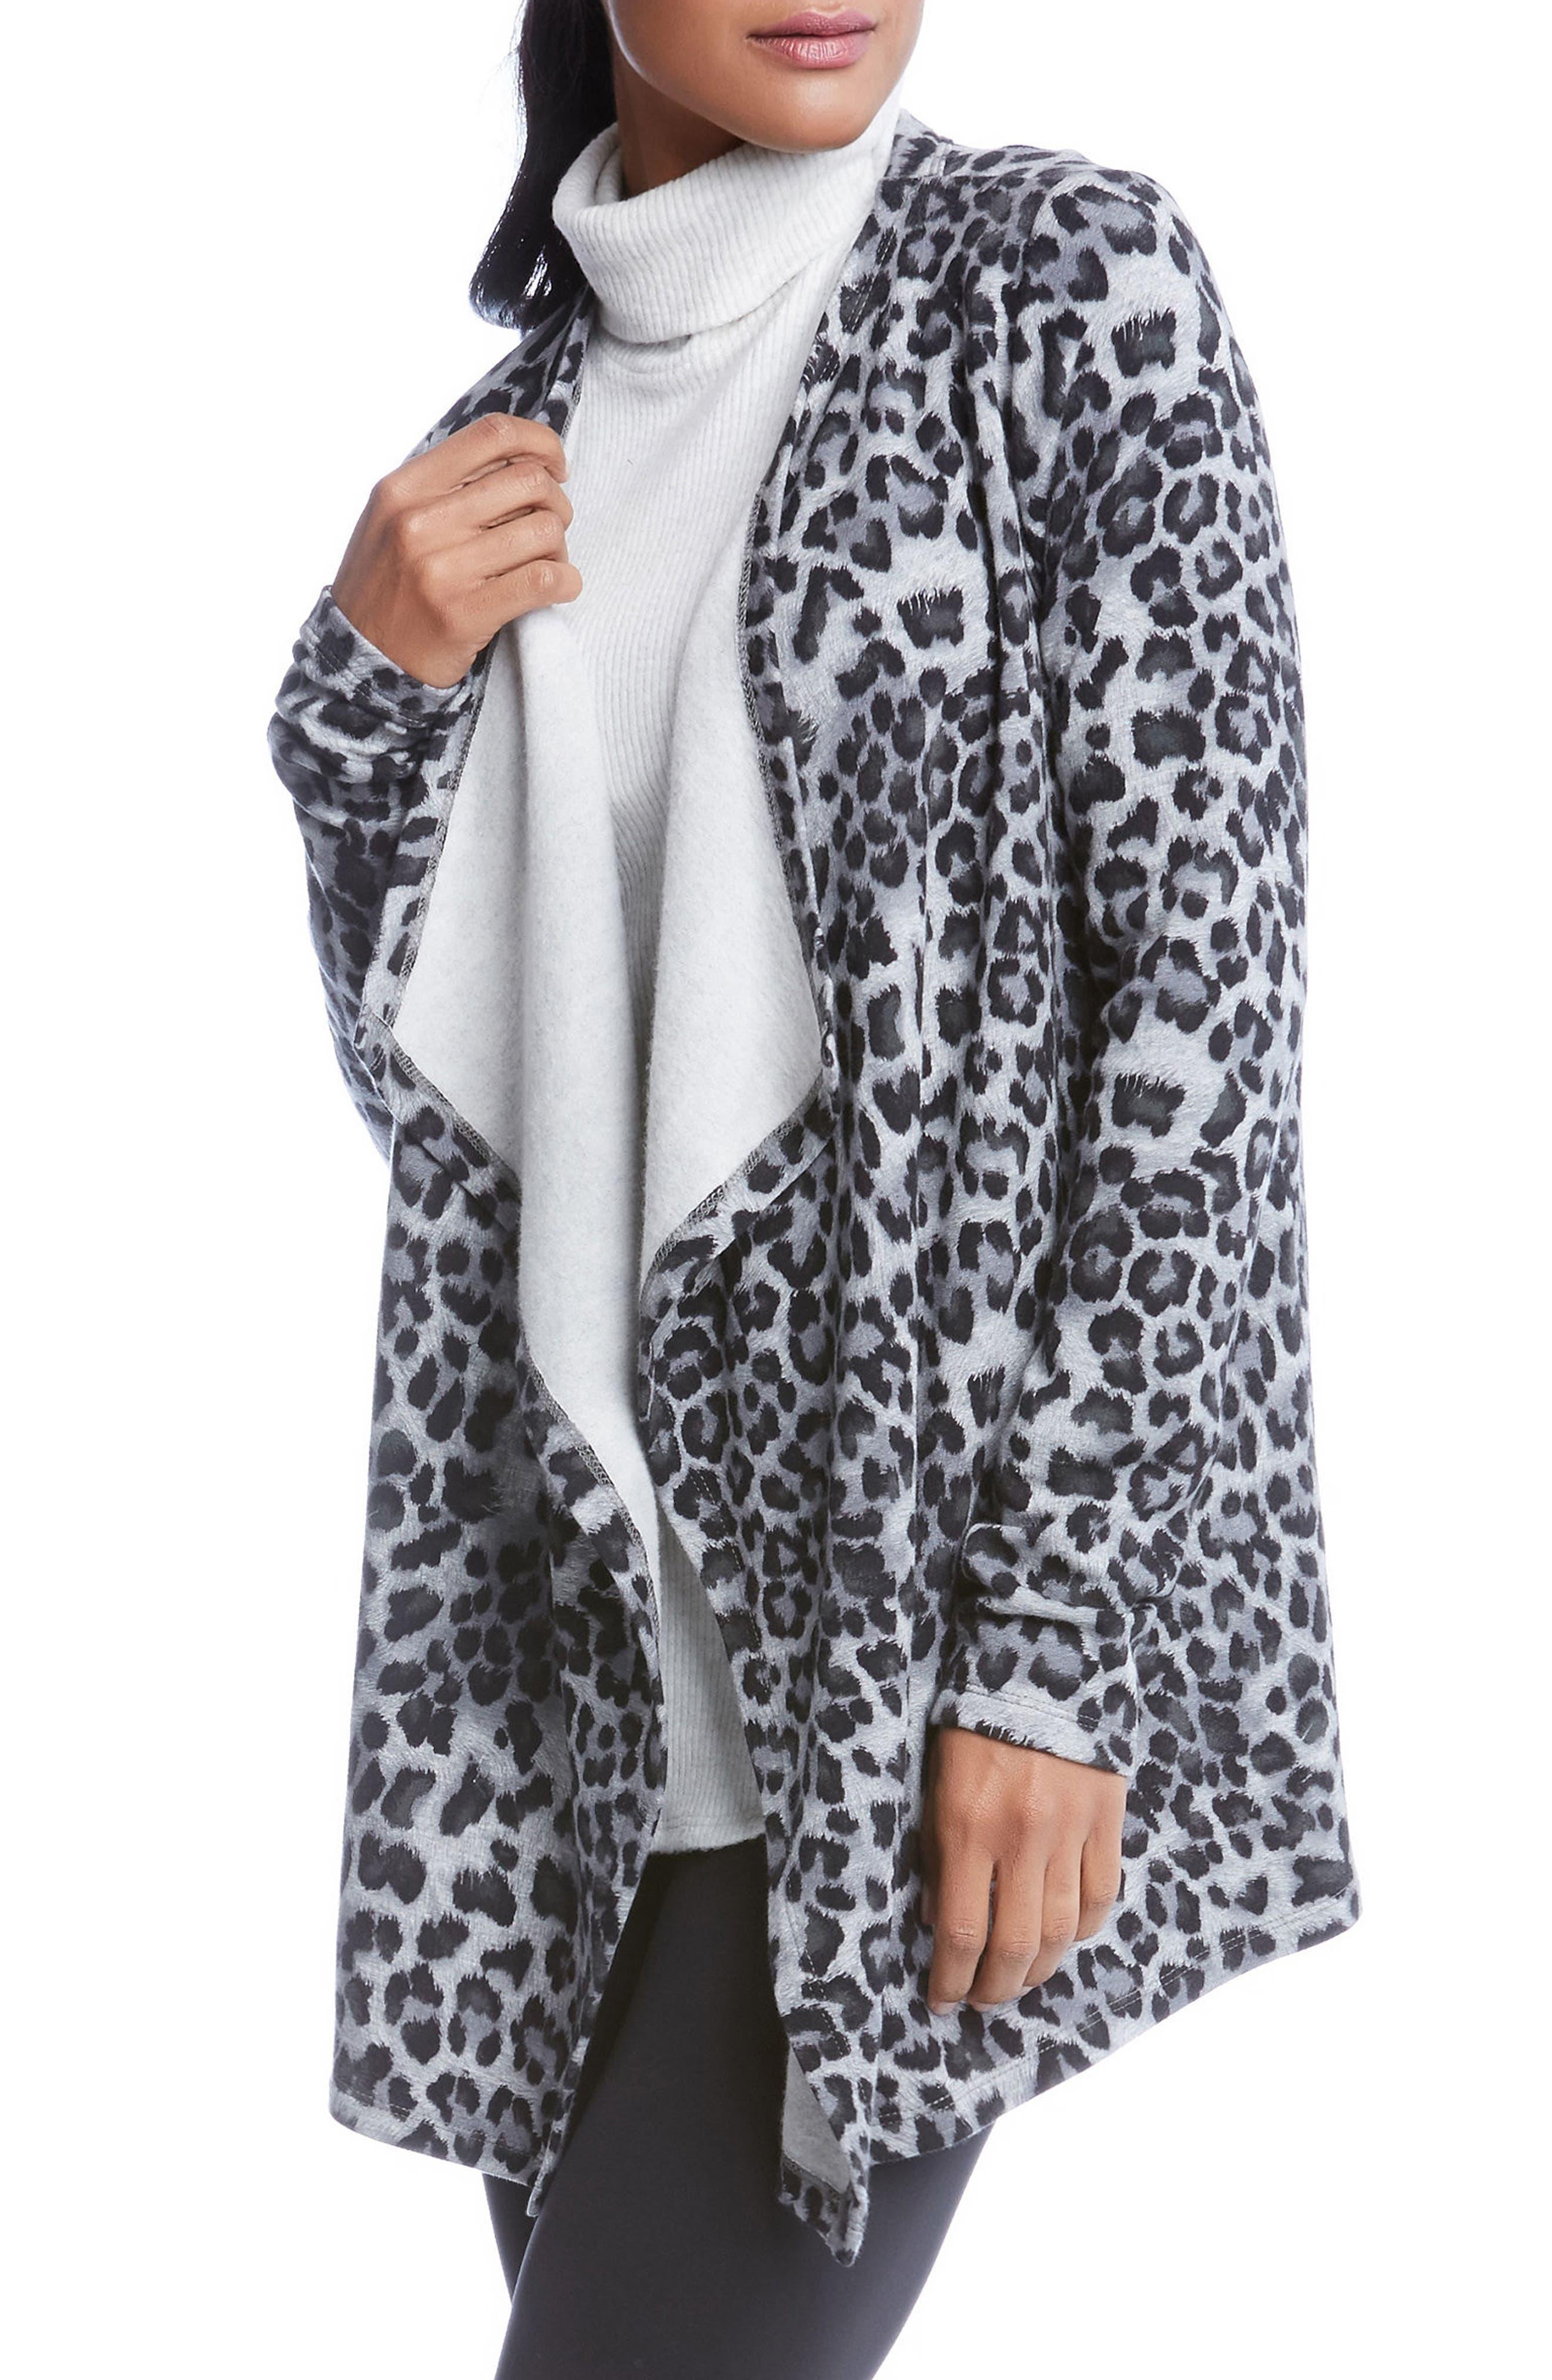 Karen Kane Leopard Print Fleece Cardigan